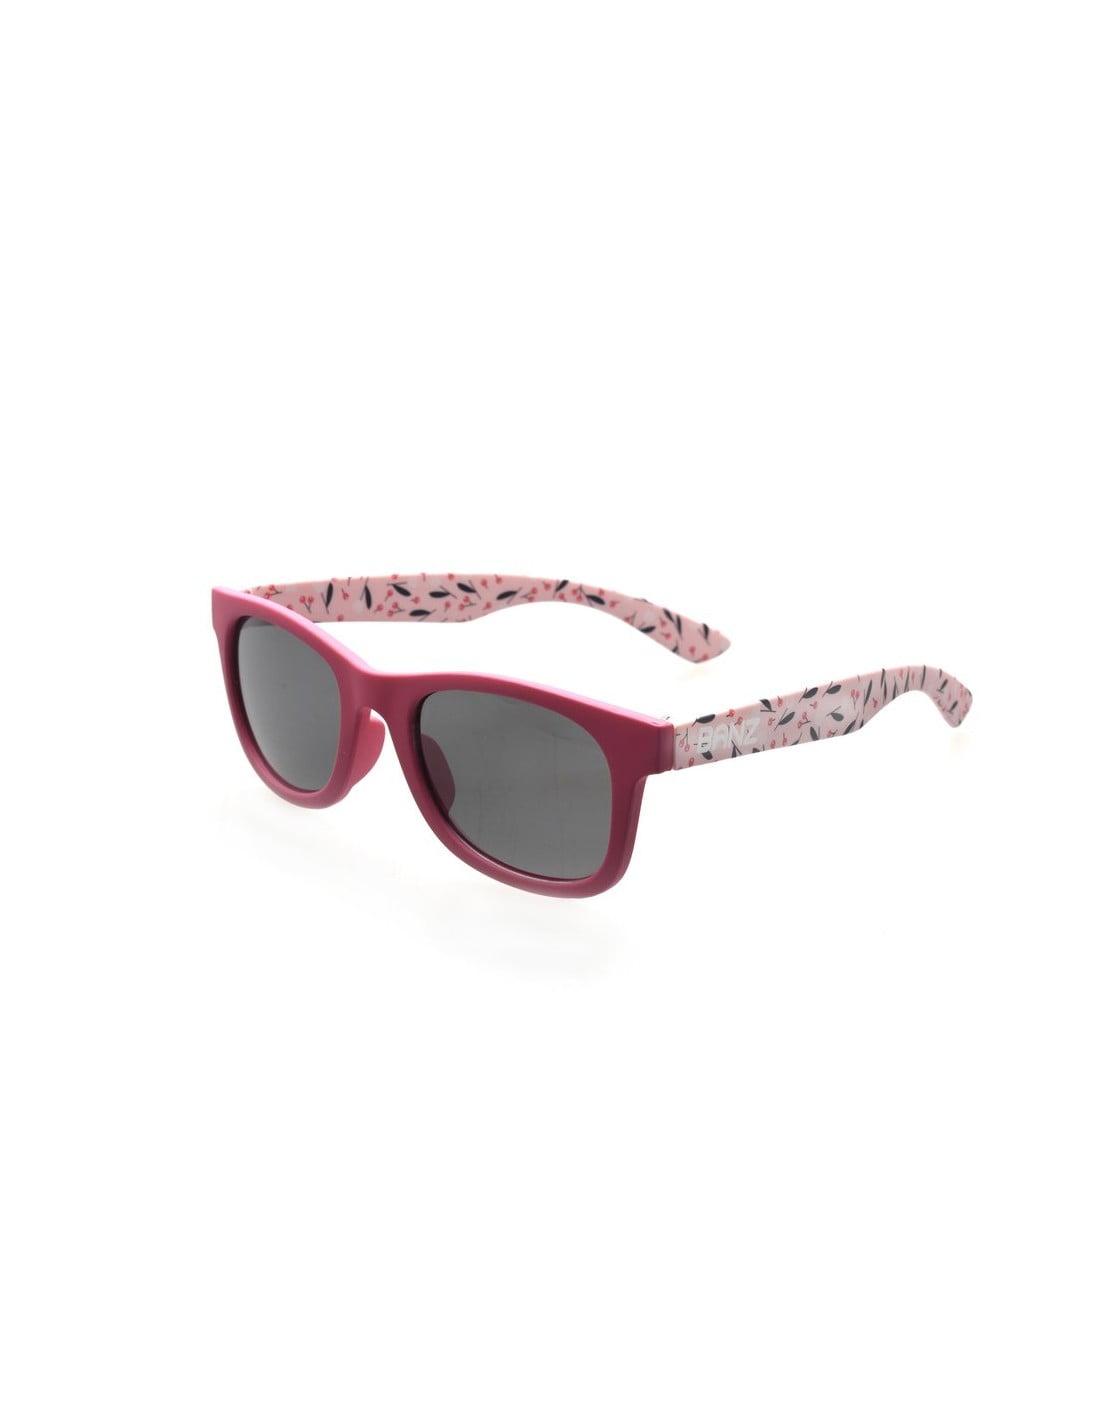 Ochelari de soare 2-4 ani J-Banz Beachcomber Cherry Floral